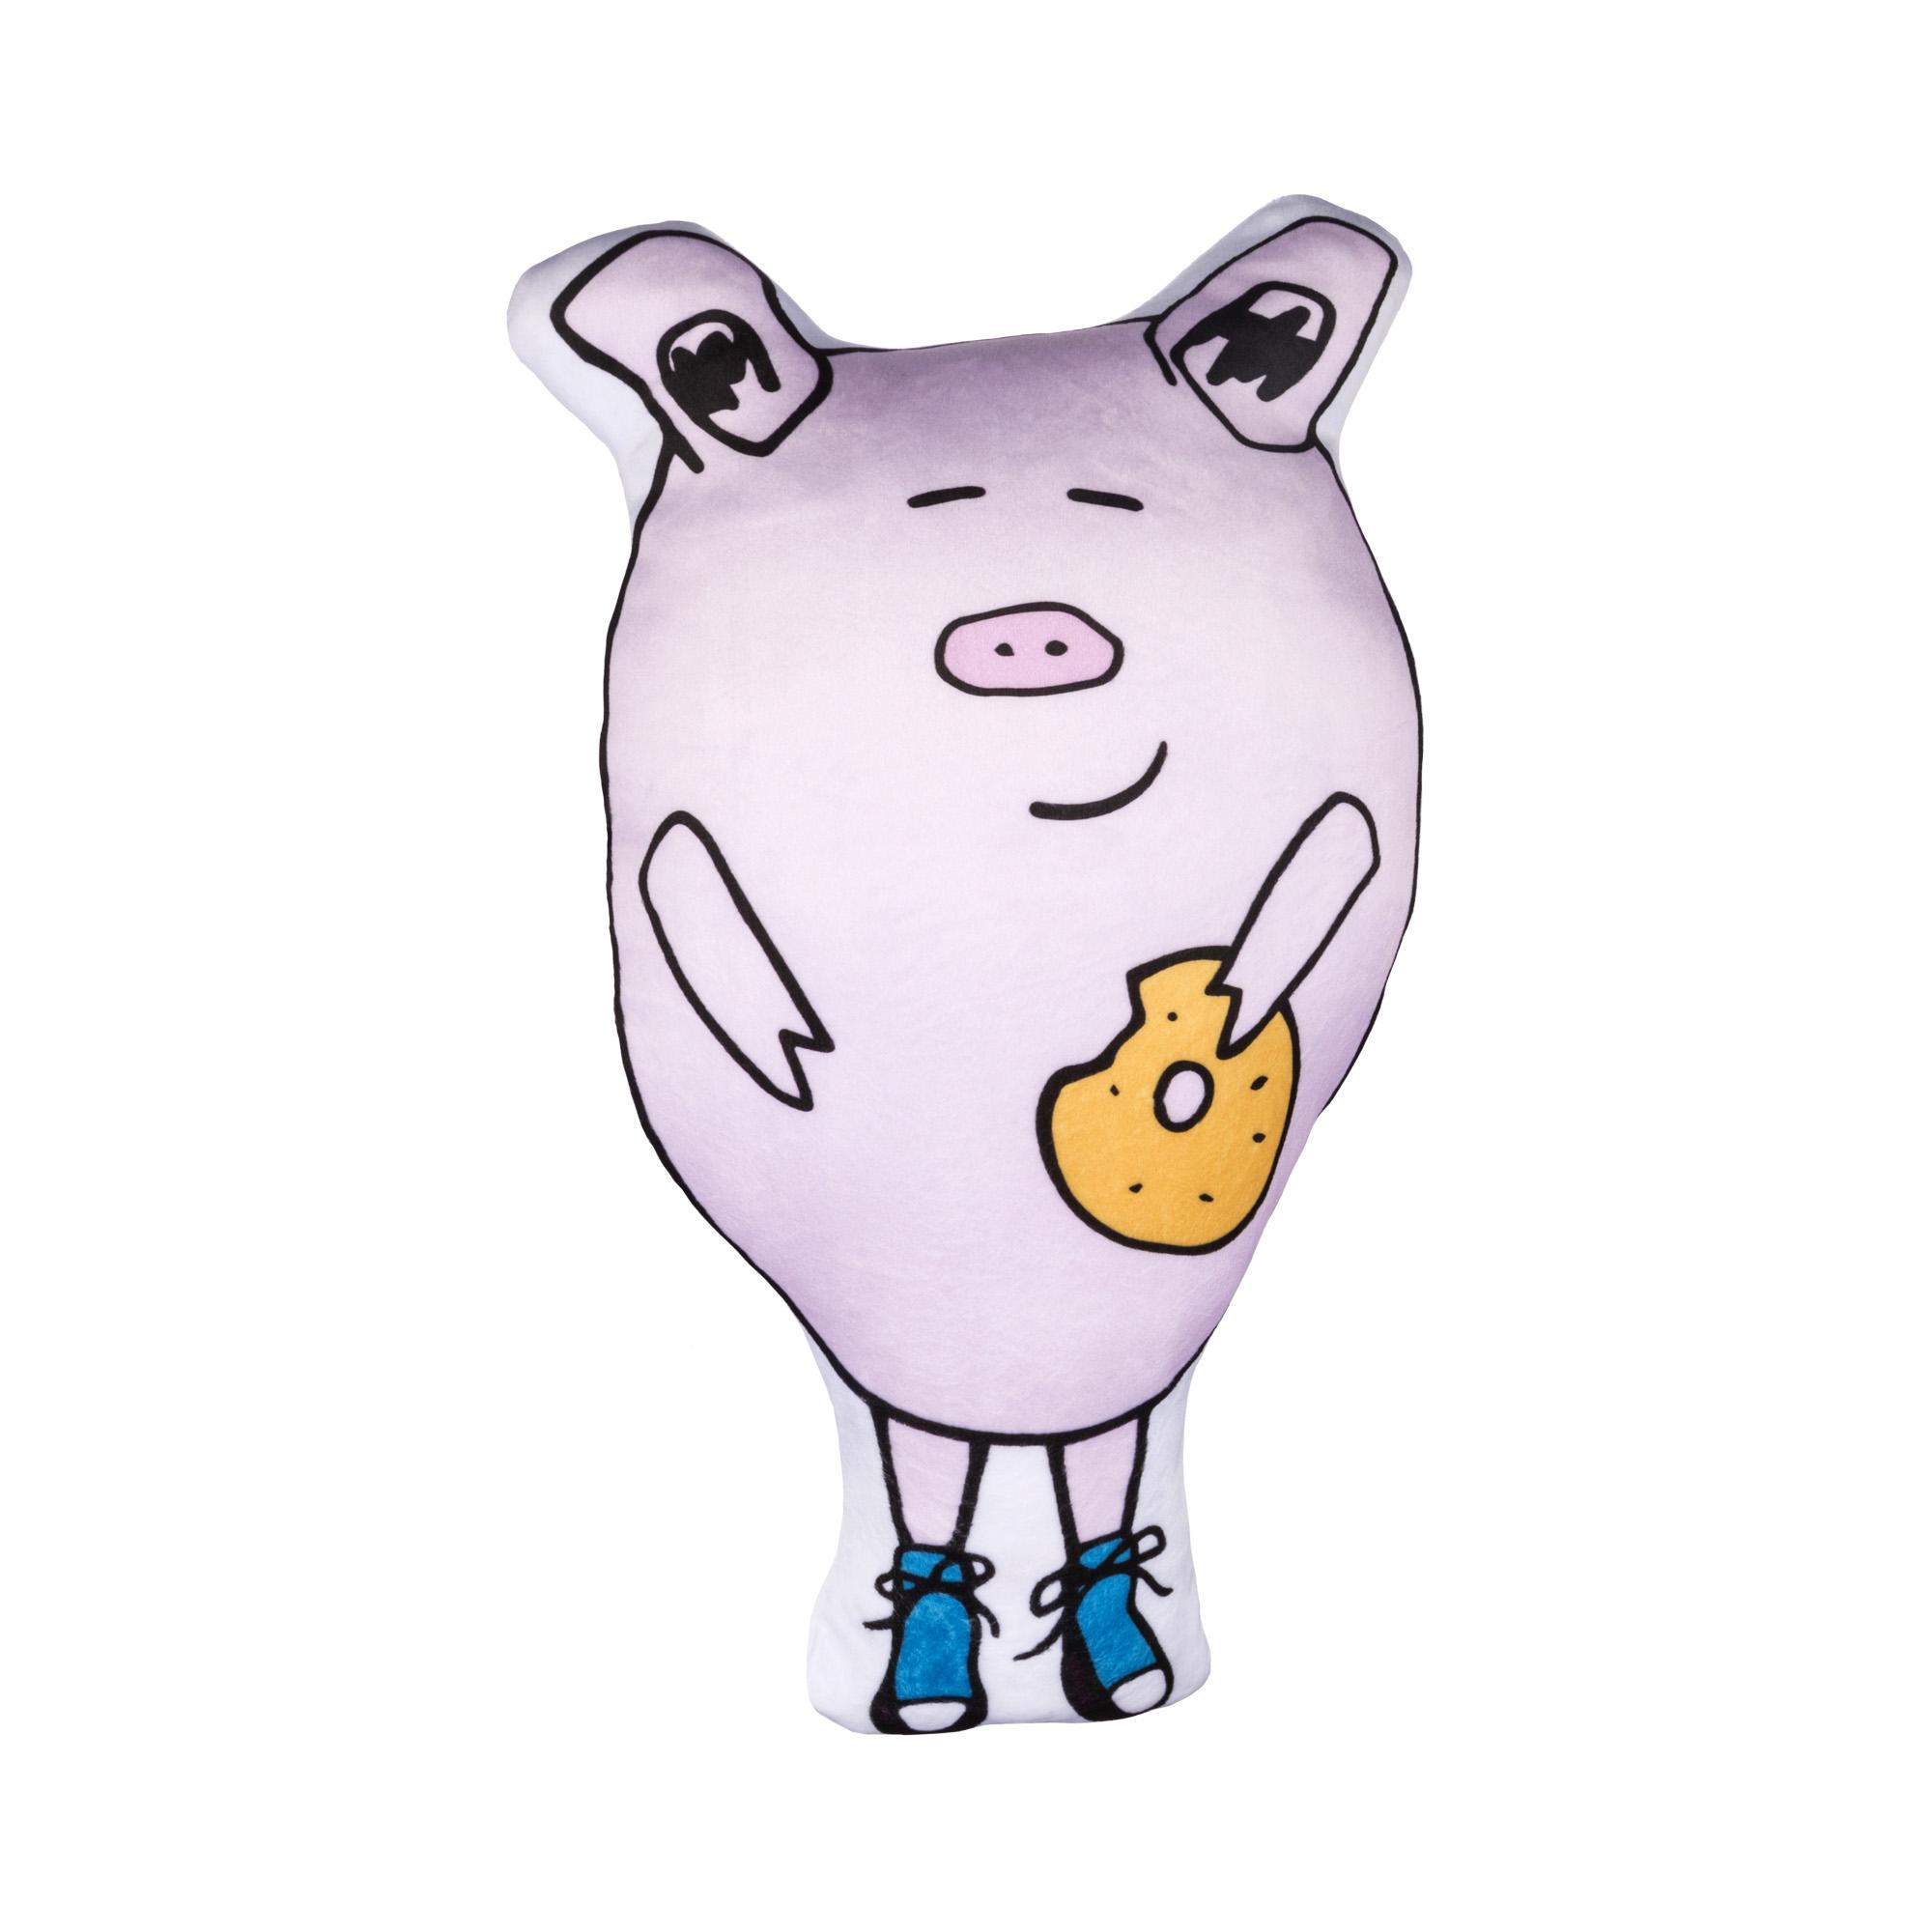 Мягкая игрушка свинка мягкая игрушка other xp a00101